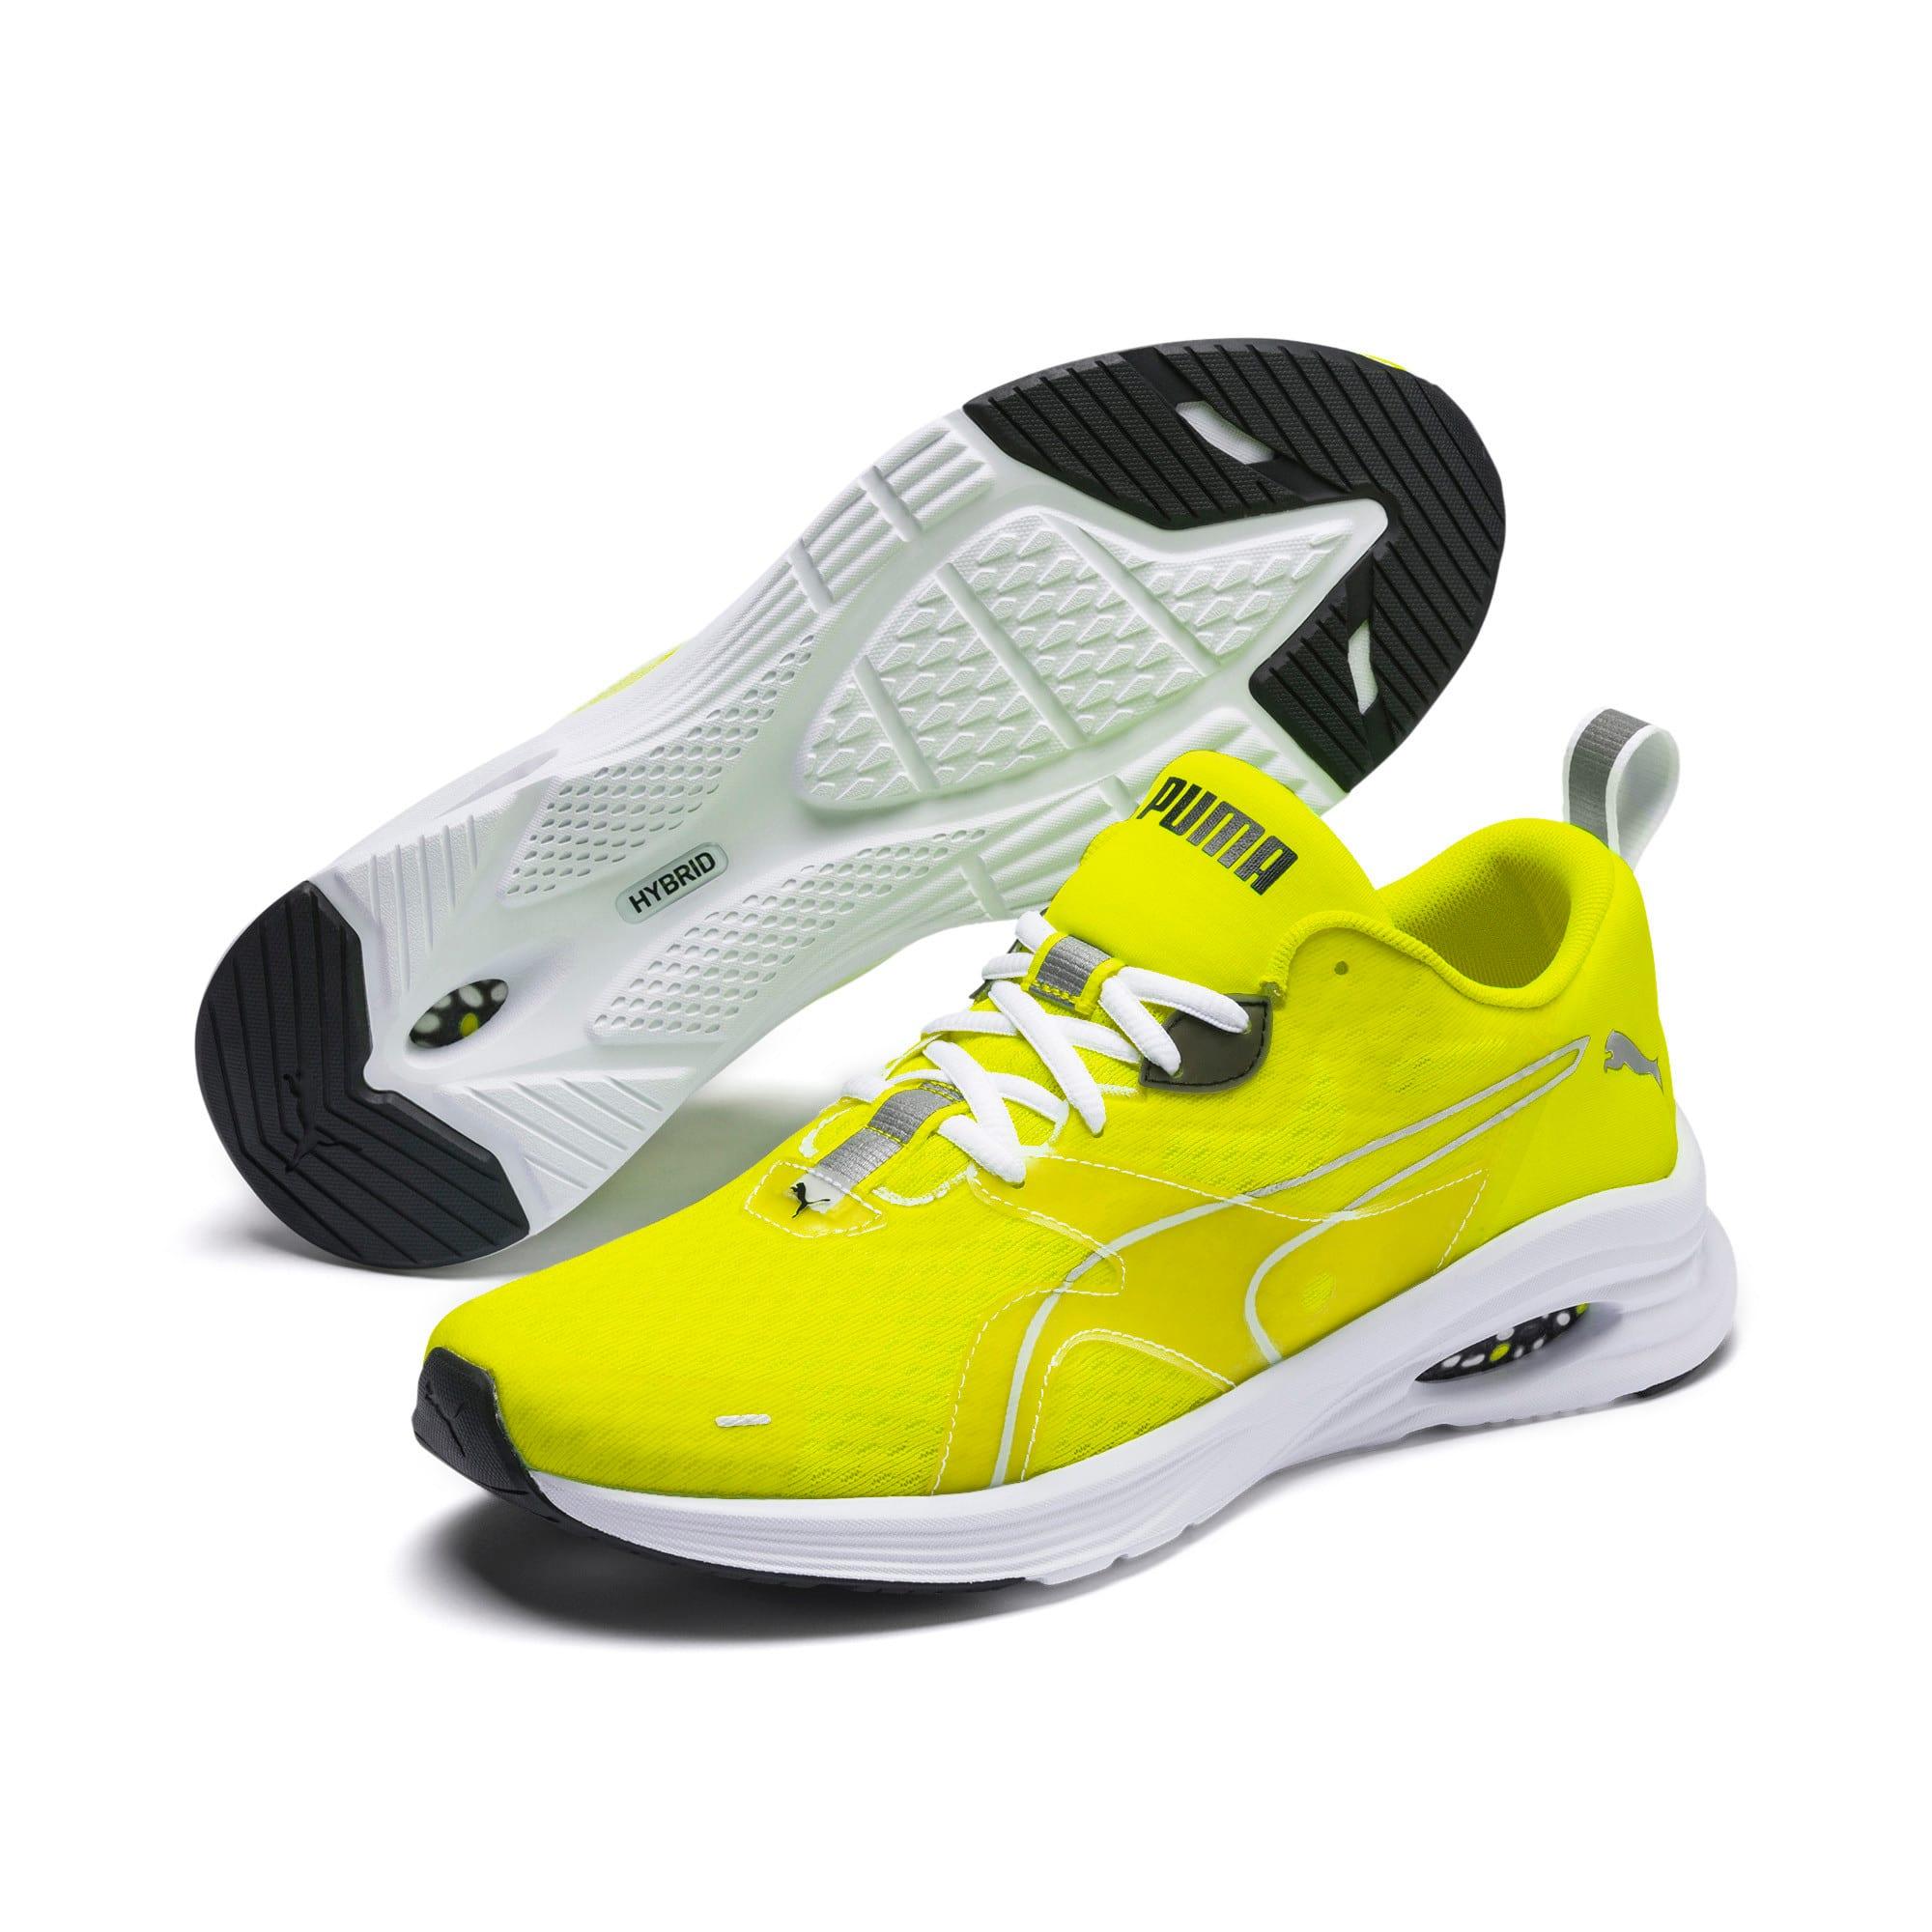 Thumbnail 2 of HYBRID Fuego Lights Men's Running Shoes, Yellow Alert, medium